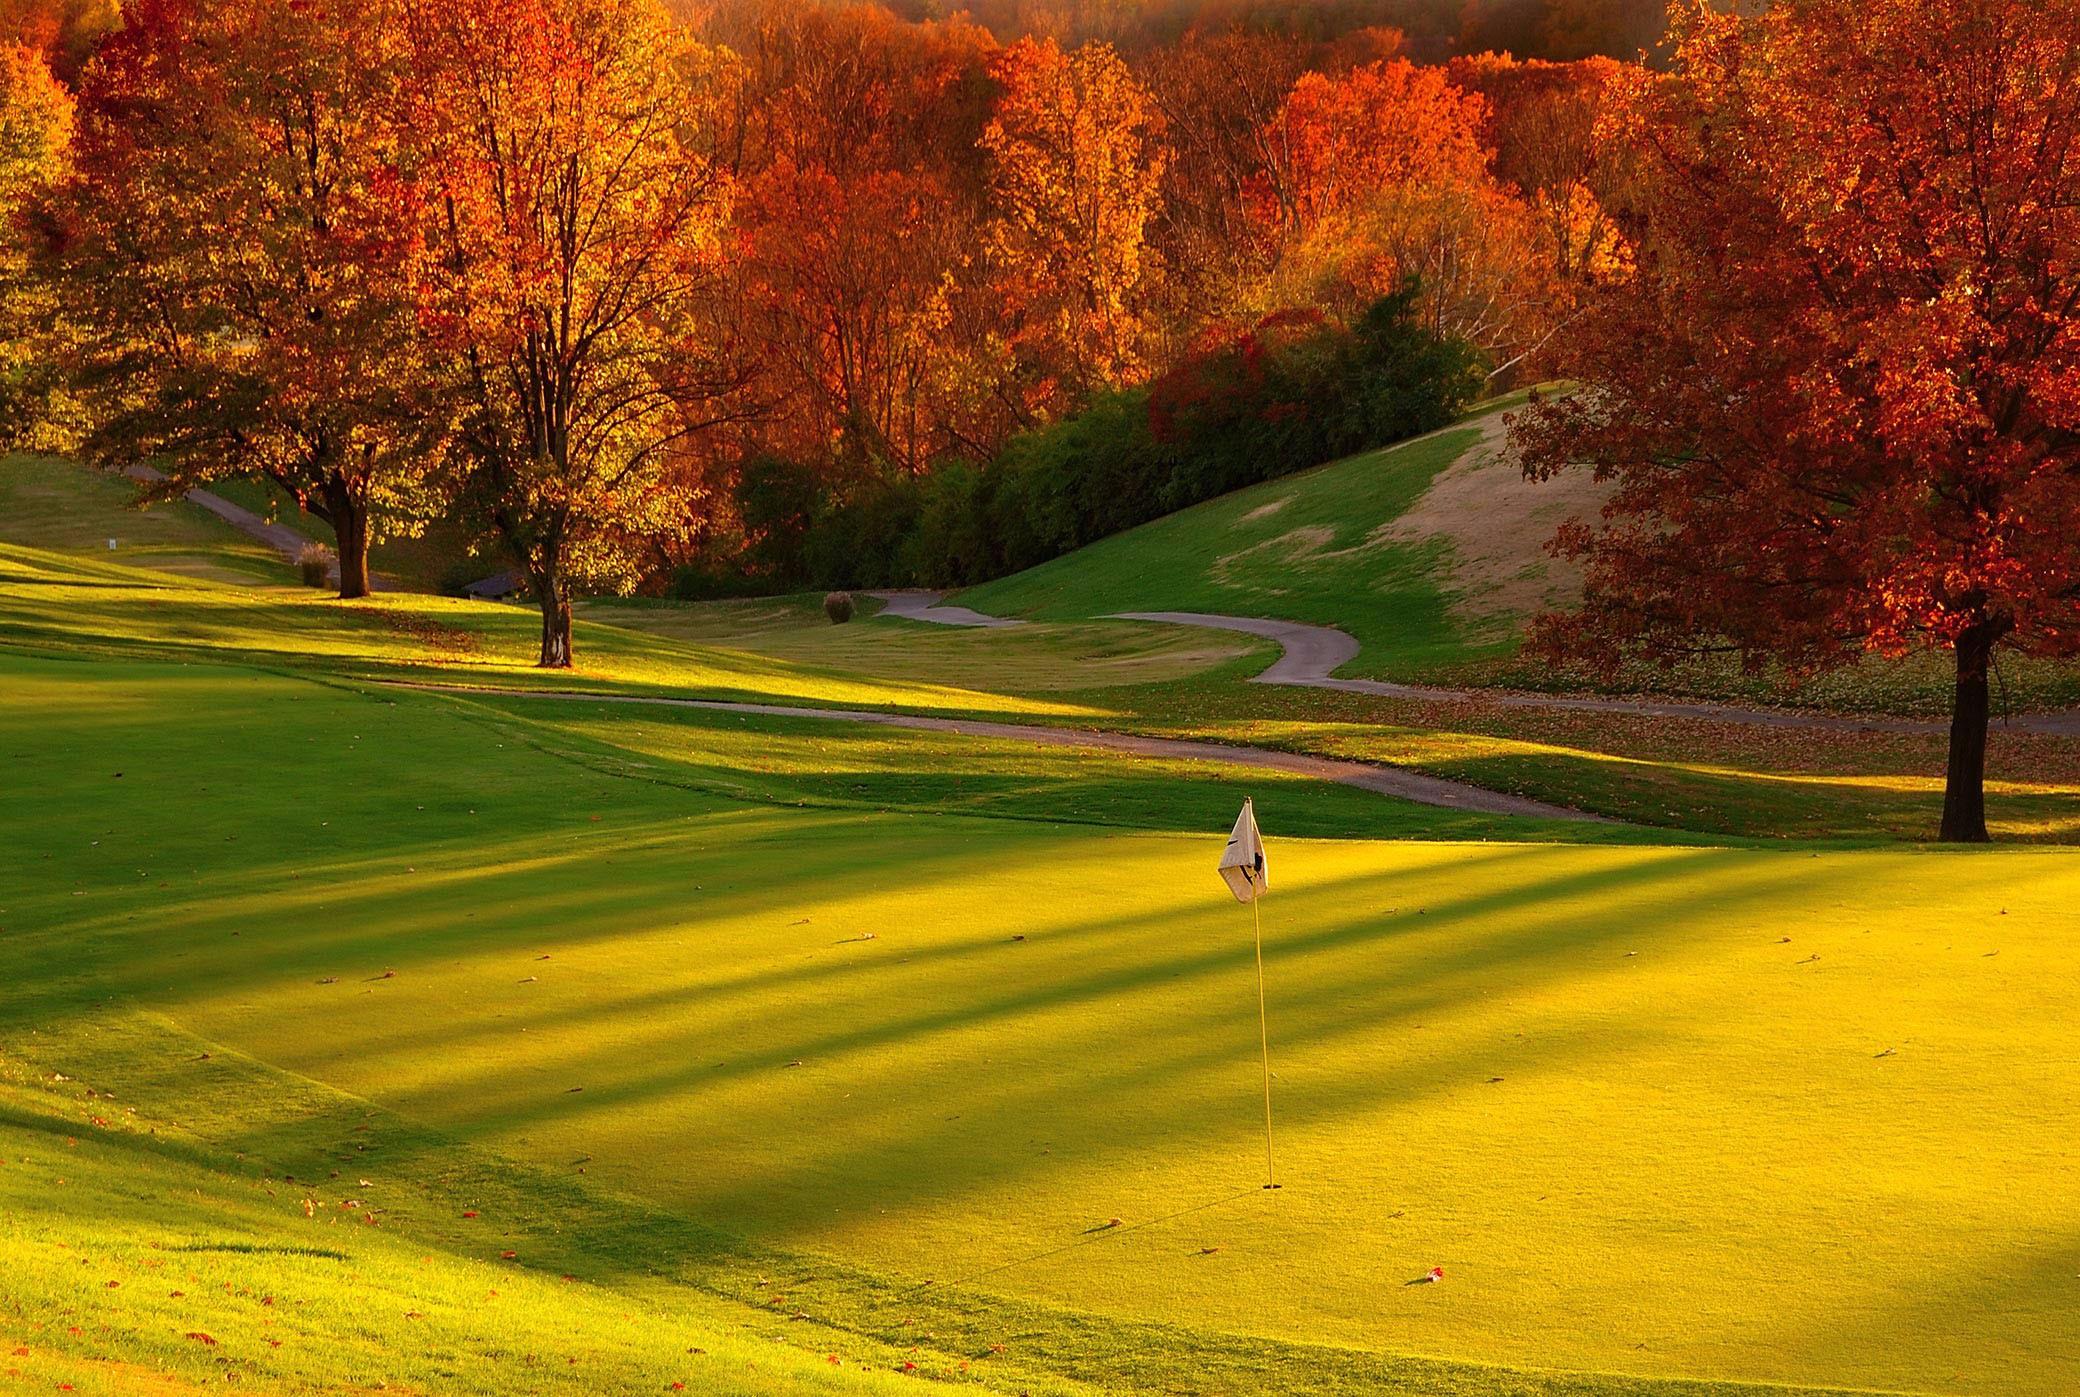 golf-course-green-flag_redux